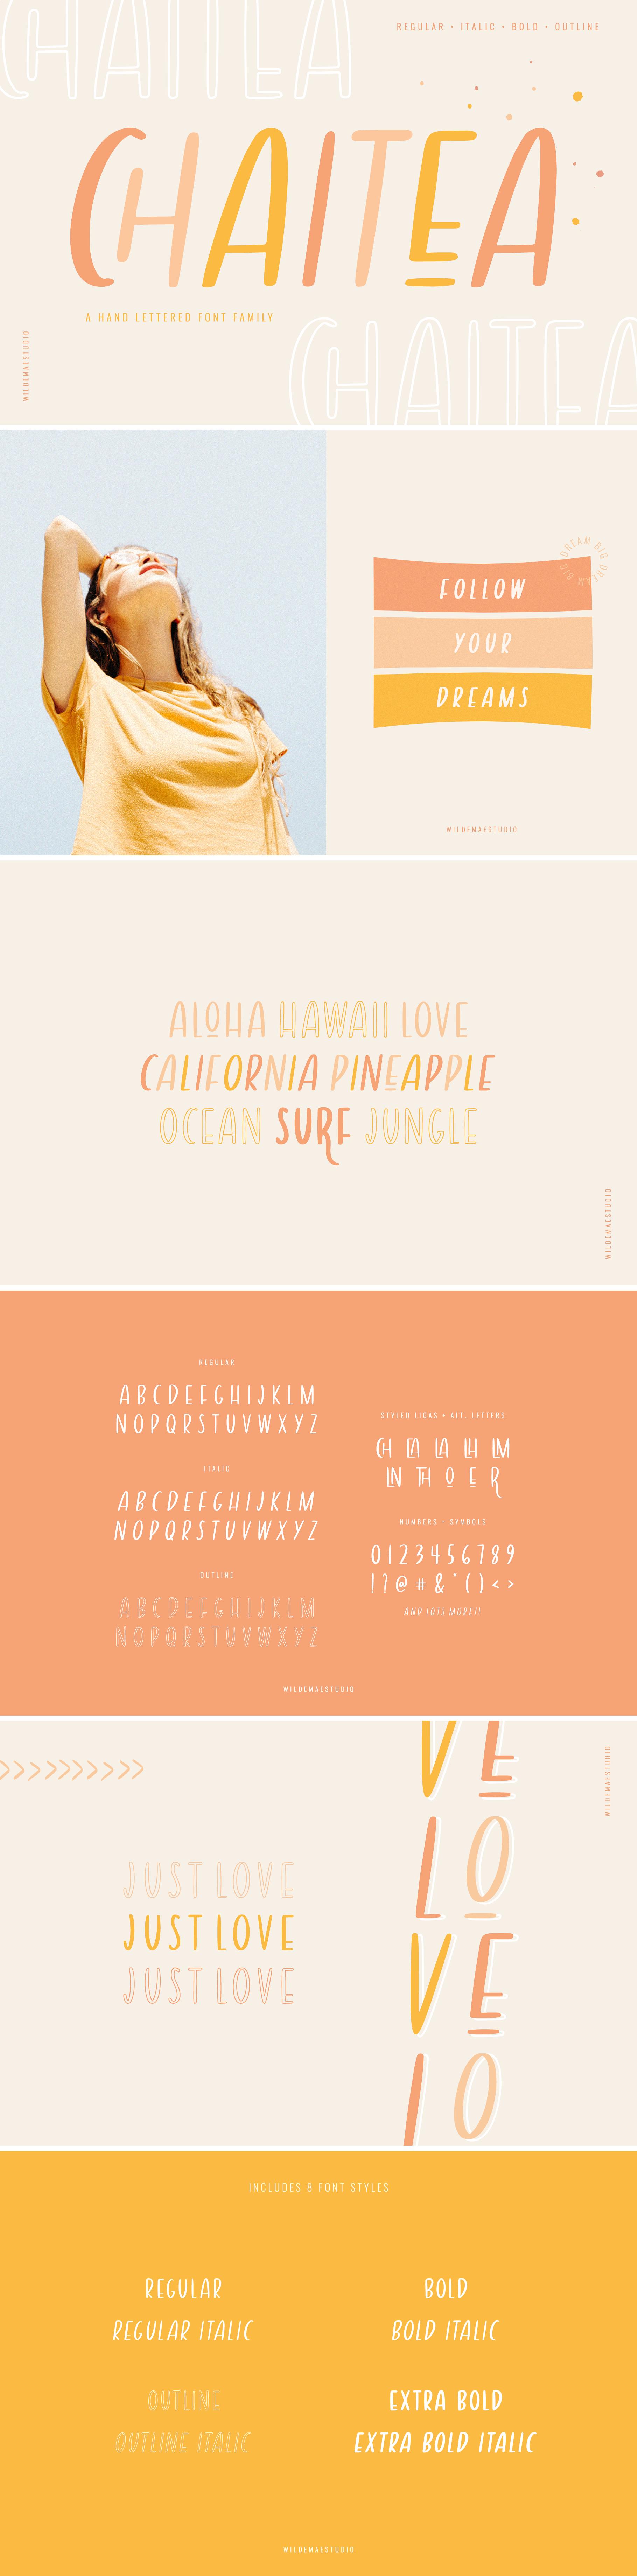 Chaitea Font Family Font Family Brush Font Sans Serif